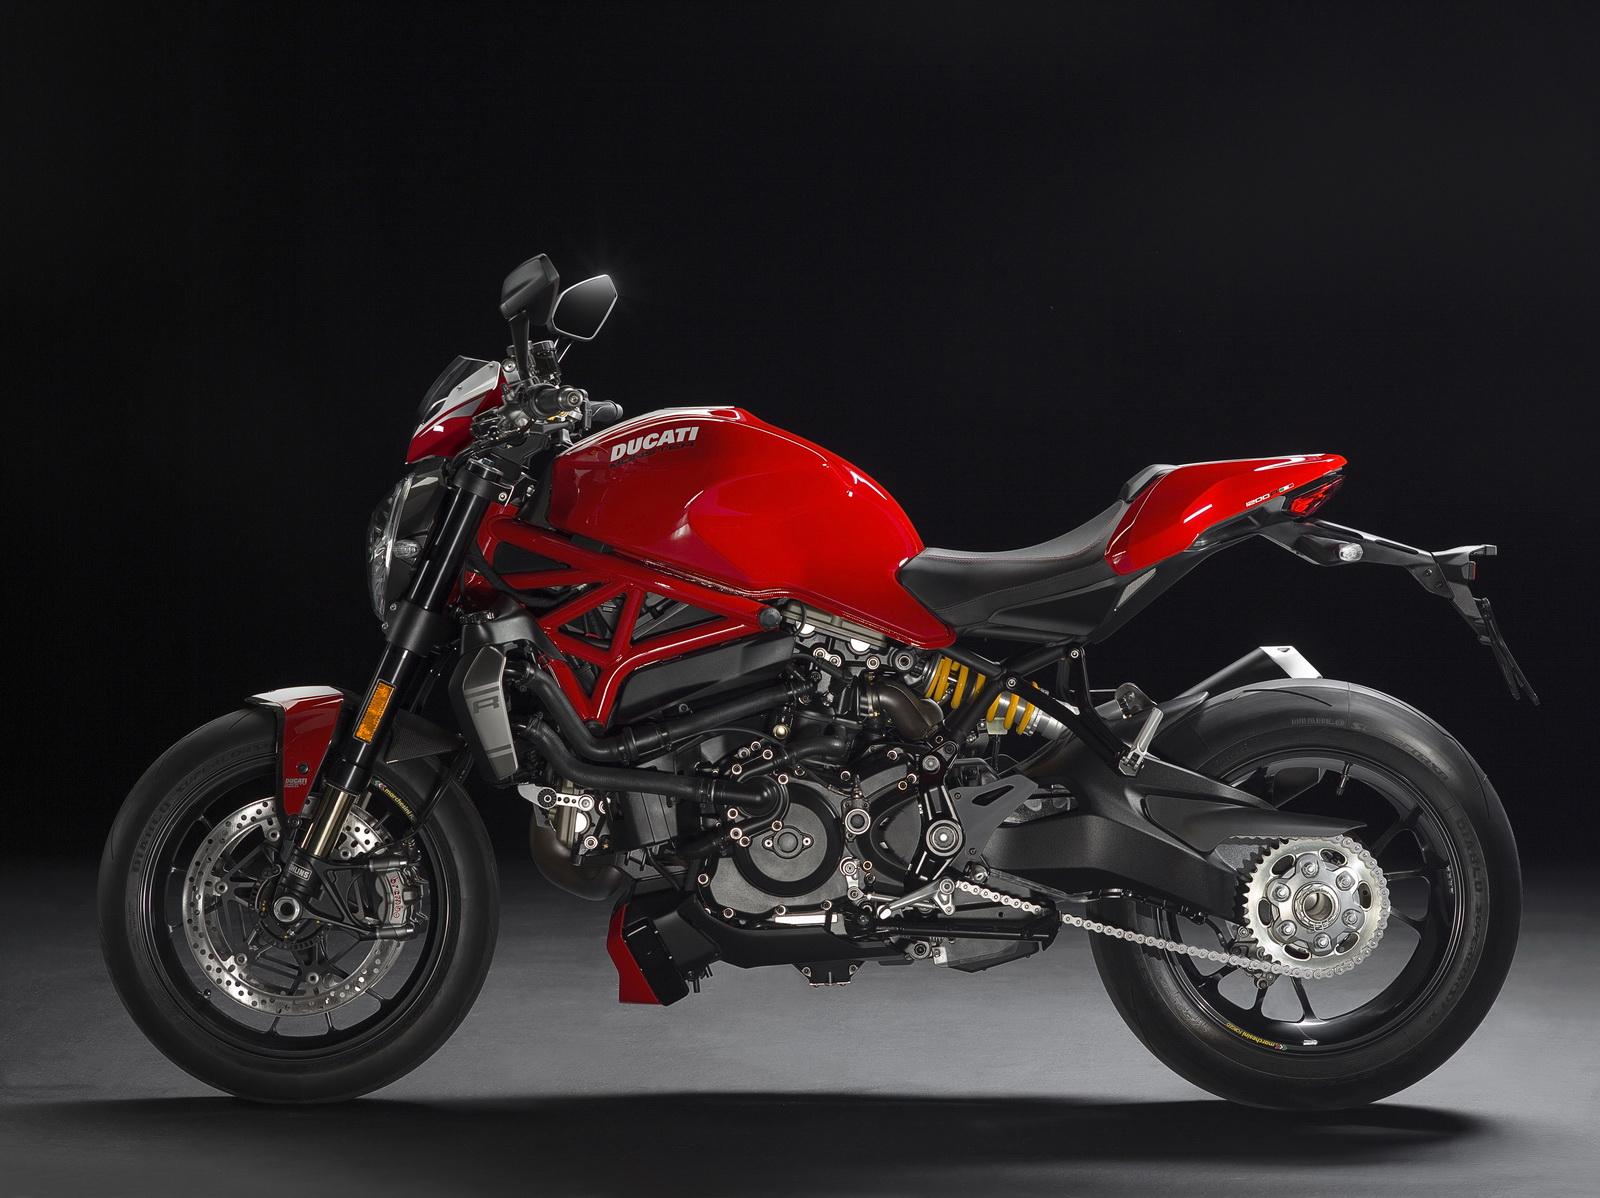 Ducati Monster 1200 R 3